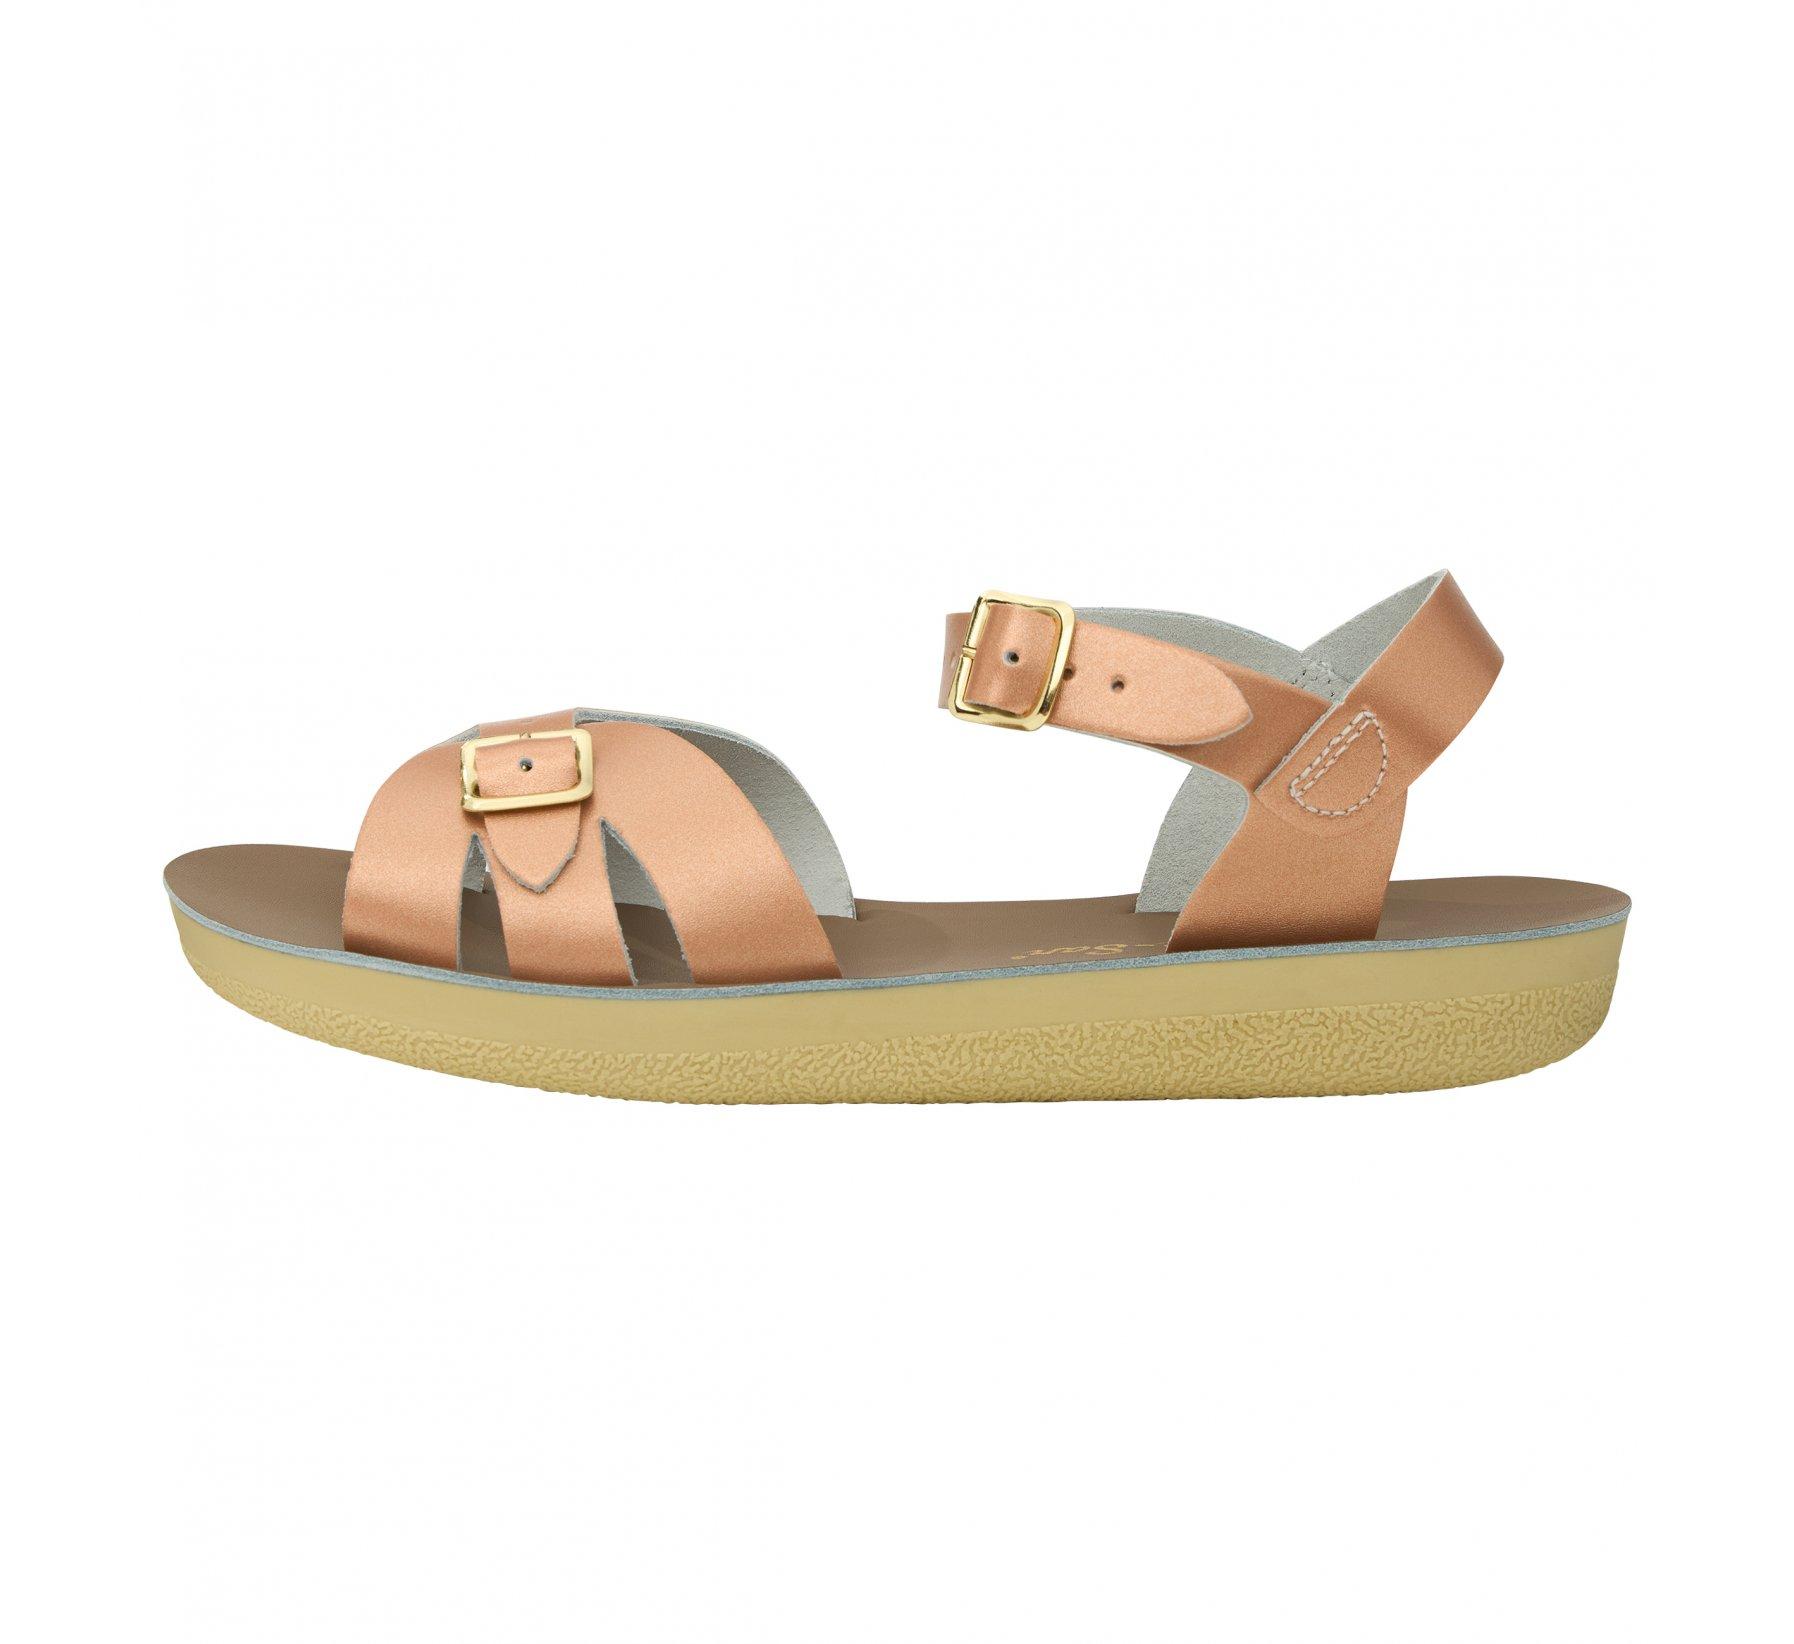 Boardwalk Rose Gold - Salt Water Sandals